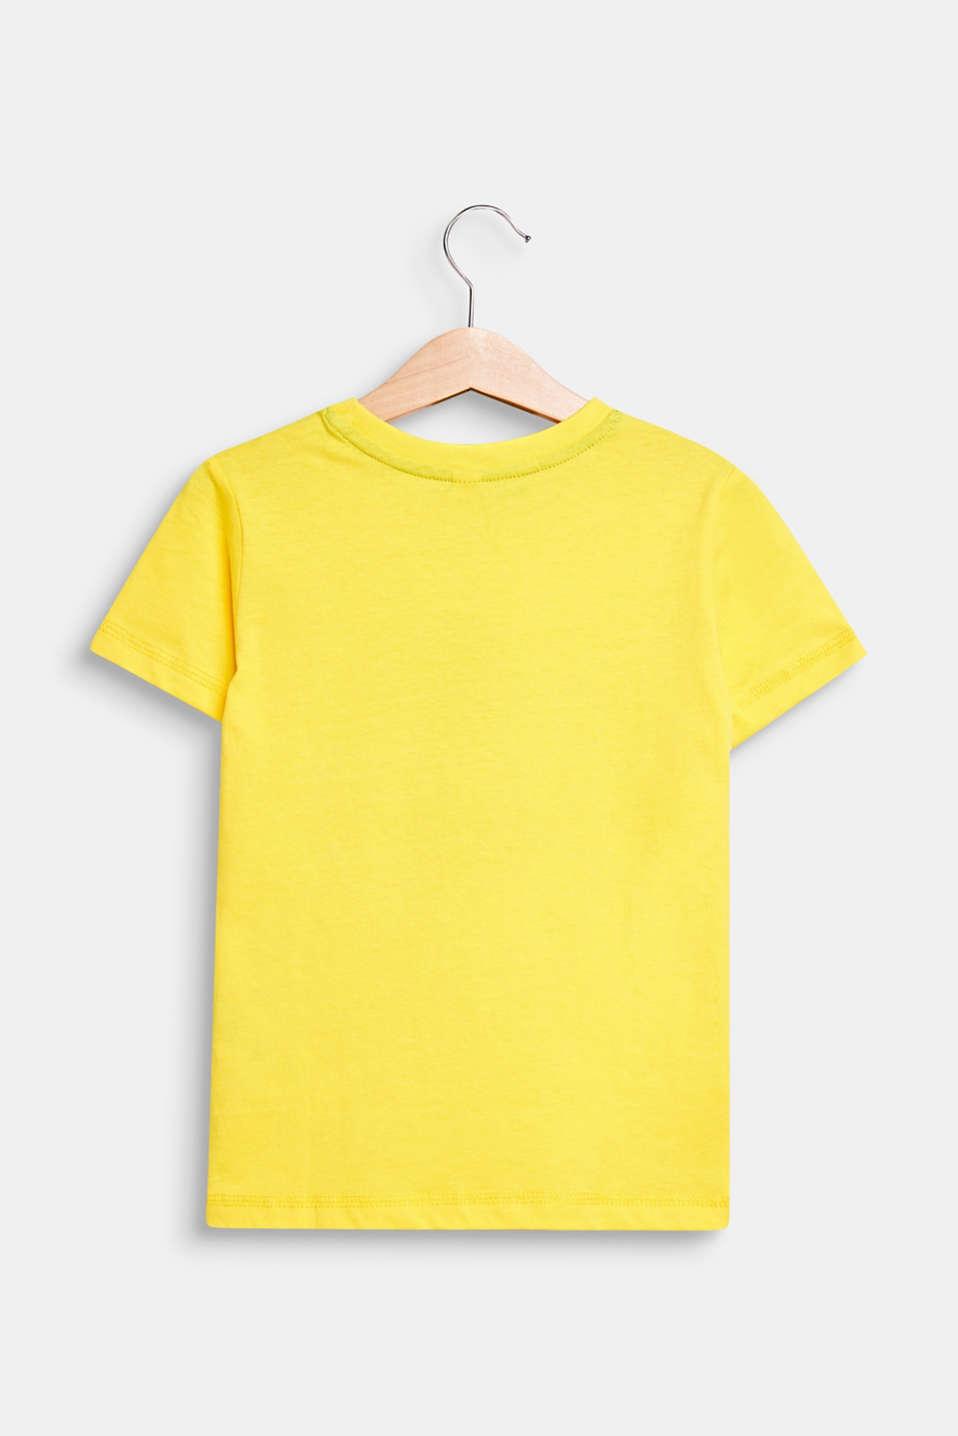 T-shirt with a shiny print, 100% cotton, LEMON, detail image number 1